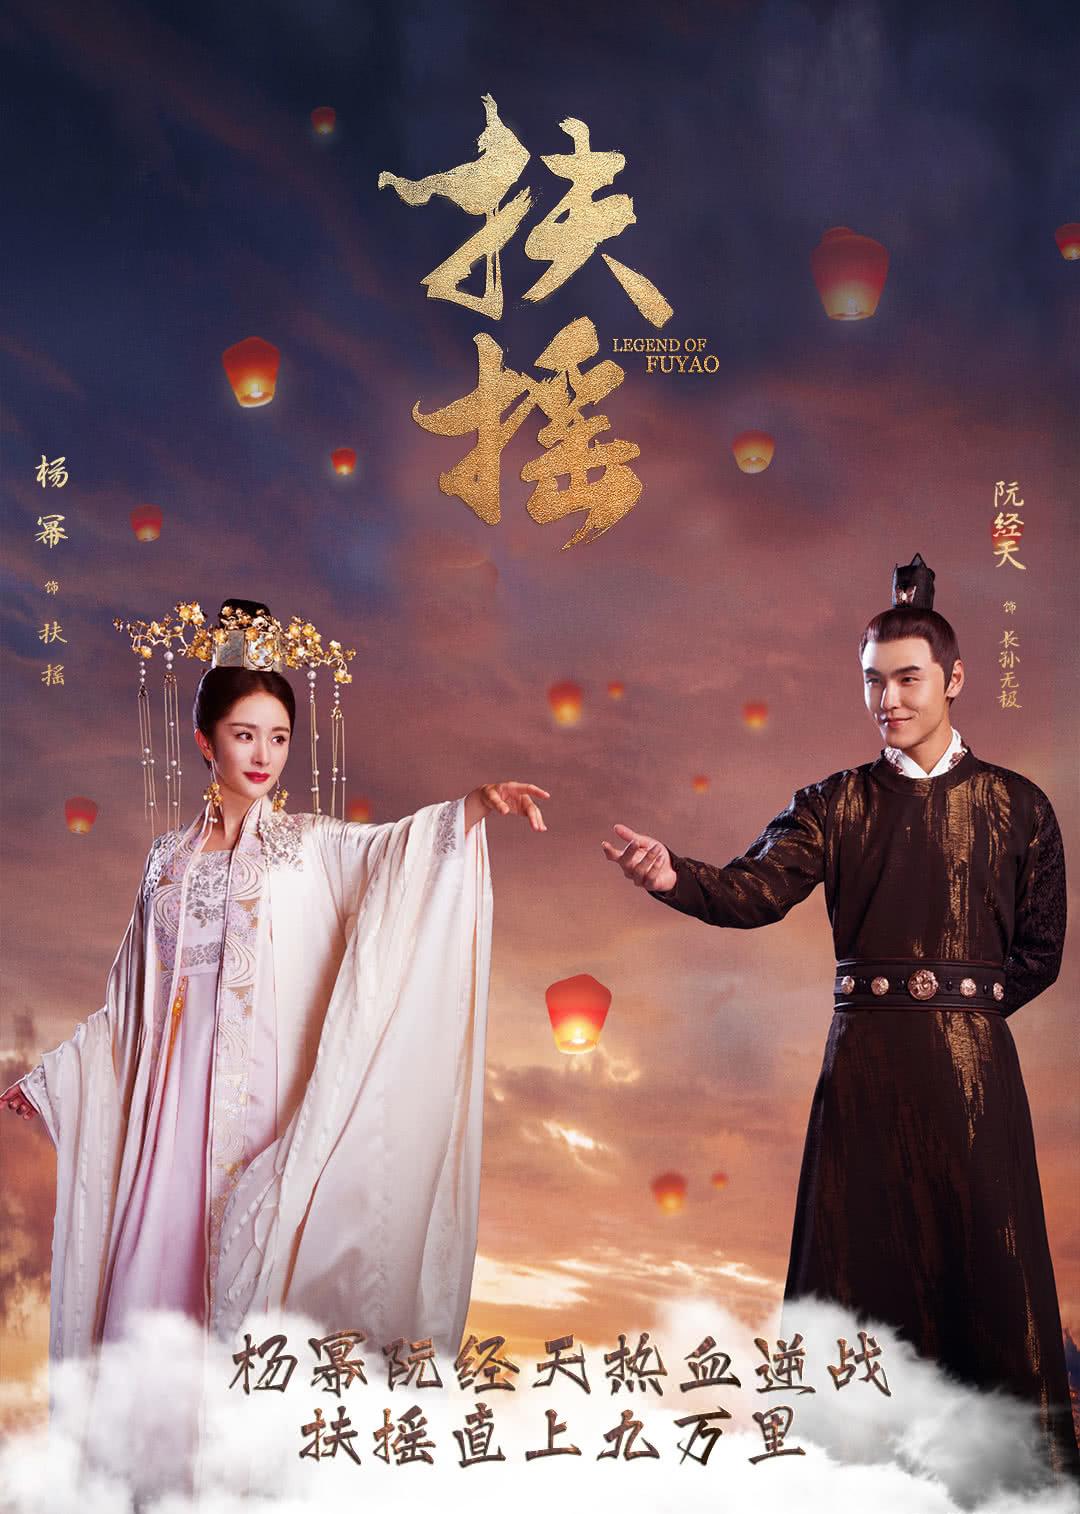 Legenda o Fu Yao - Дорама: Легенда о Фу Яо